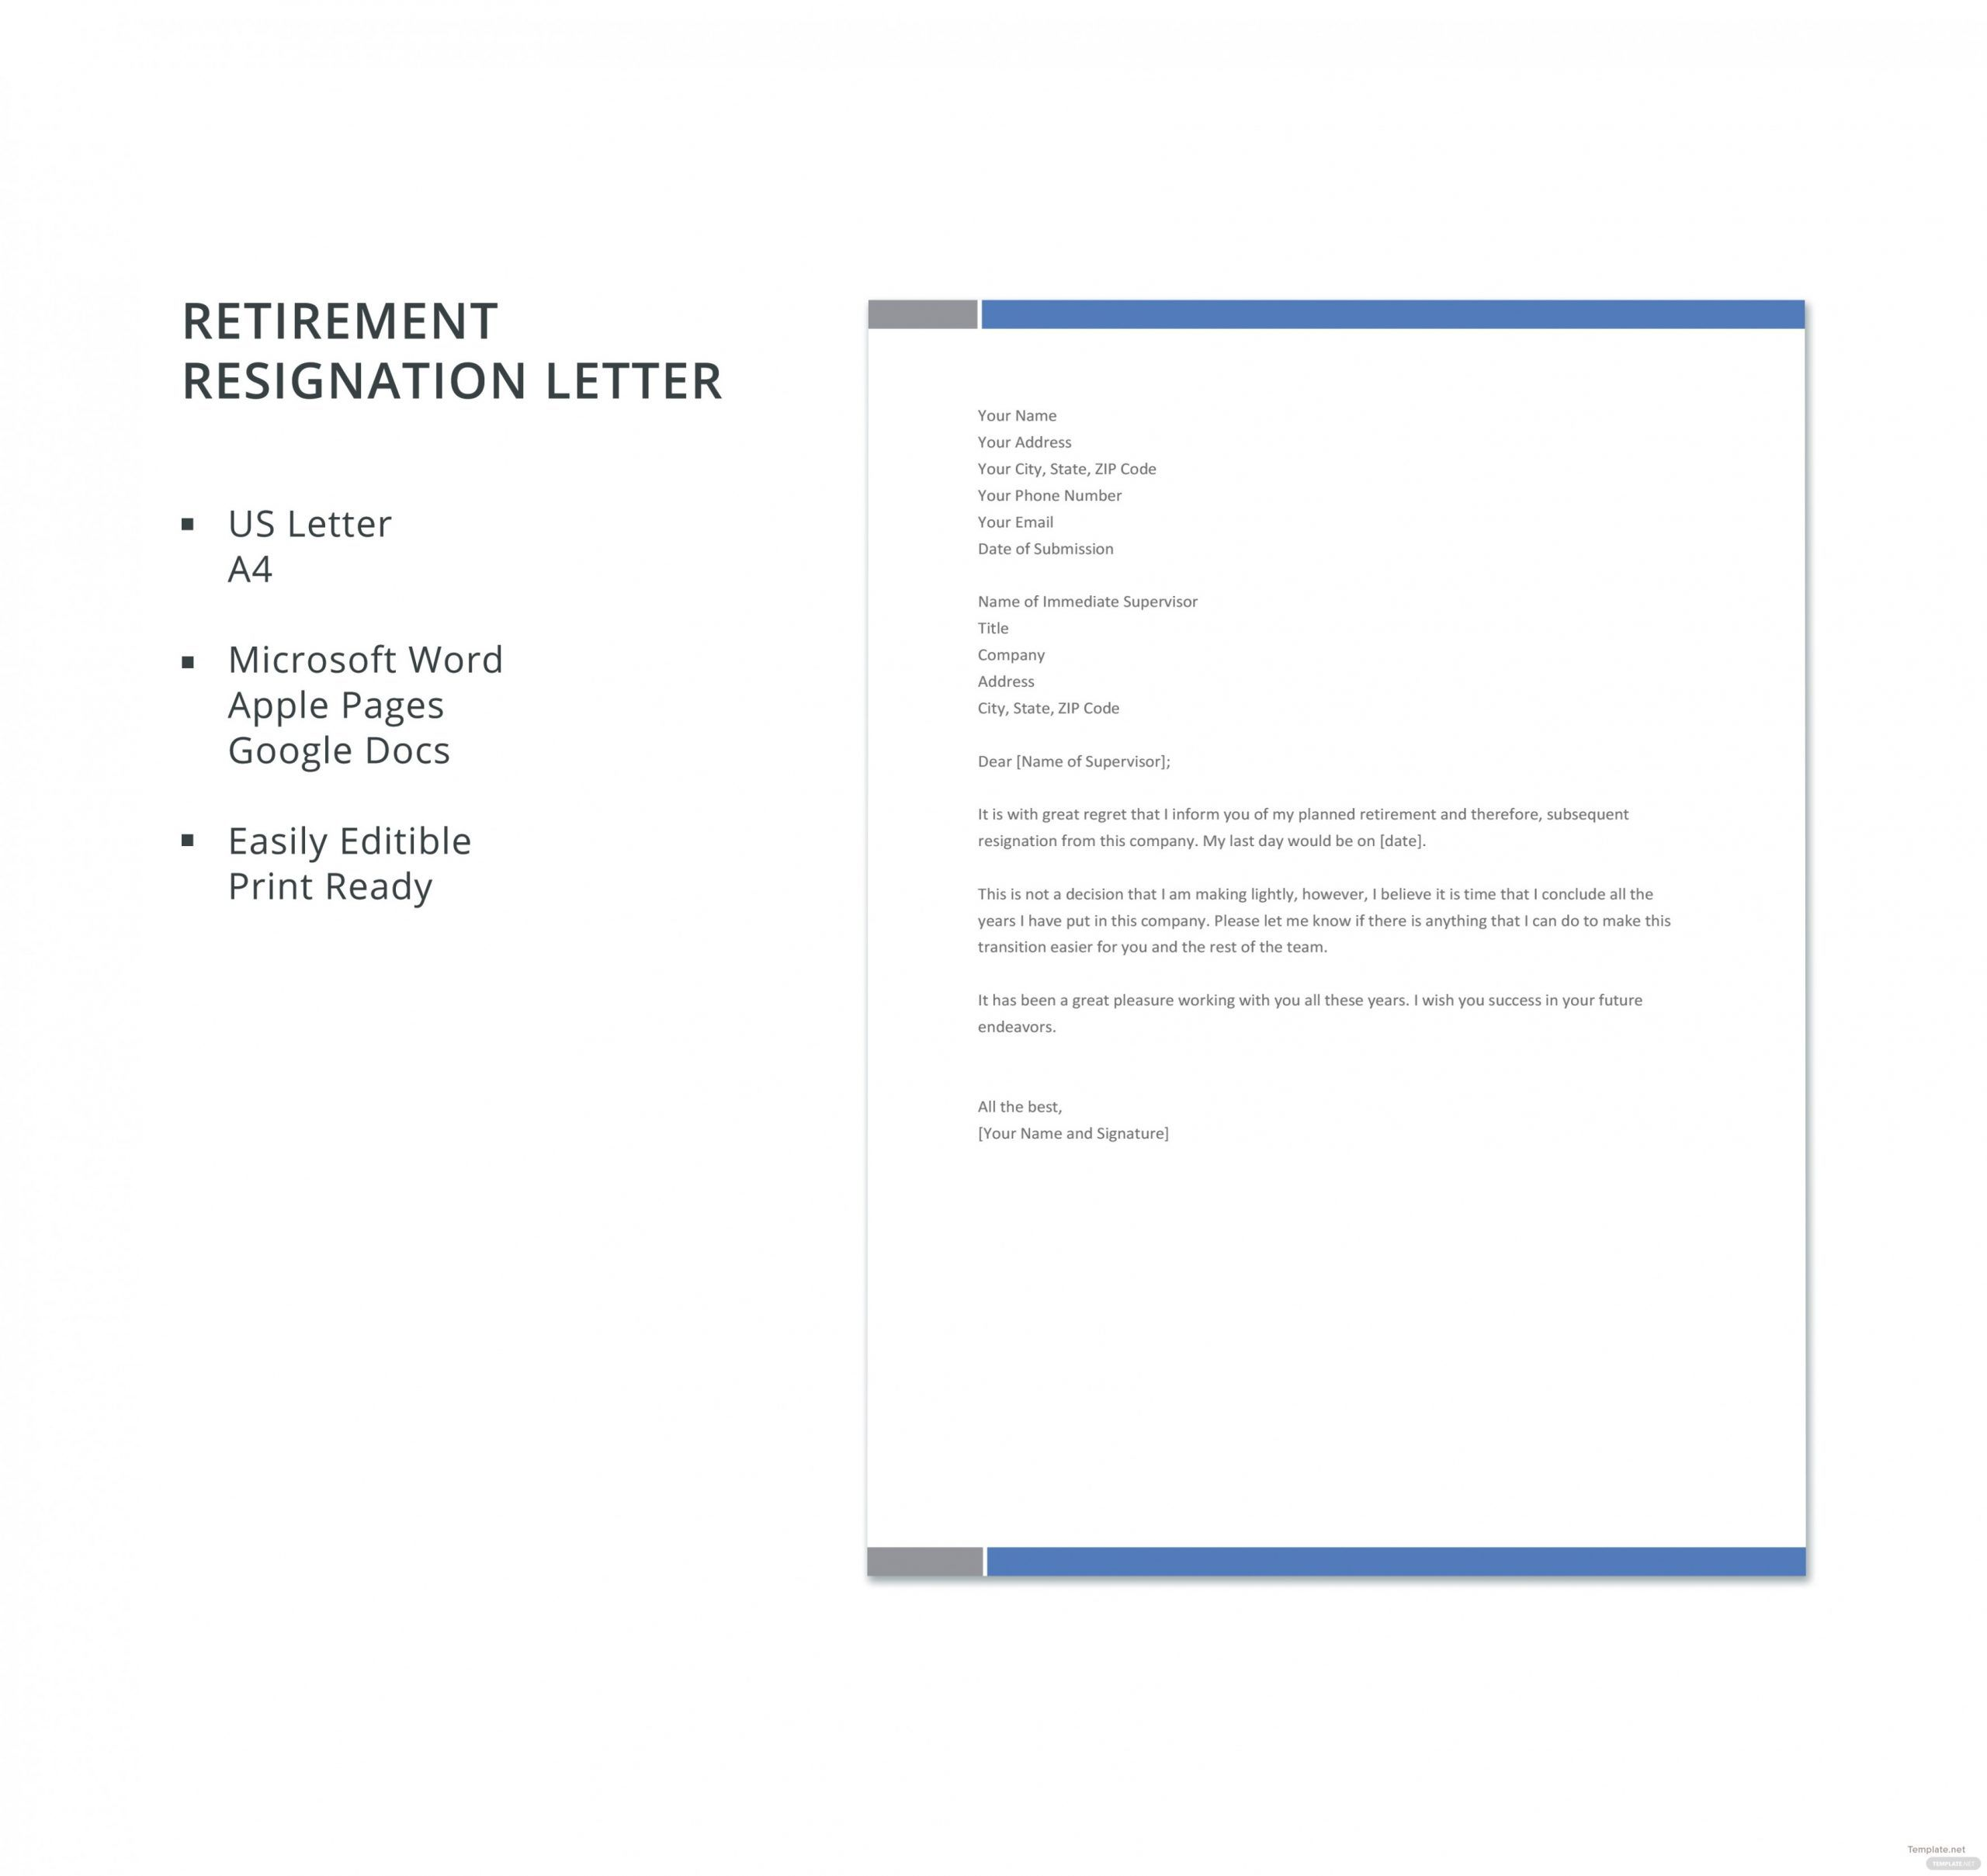 resignation retirement letter template microsoft word what career objective sample for customer service law student cv junior software developer